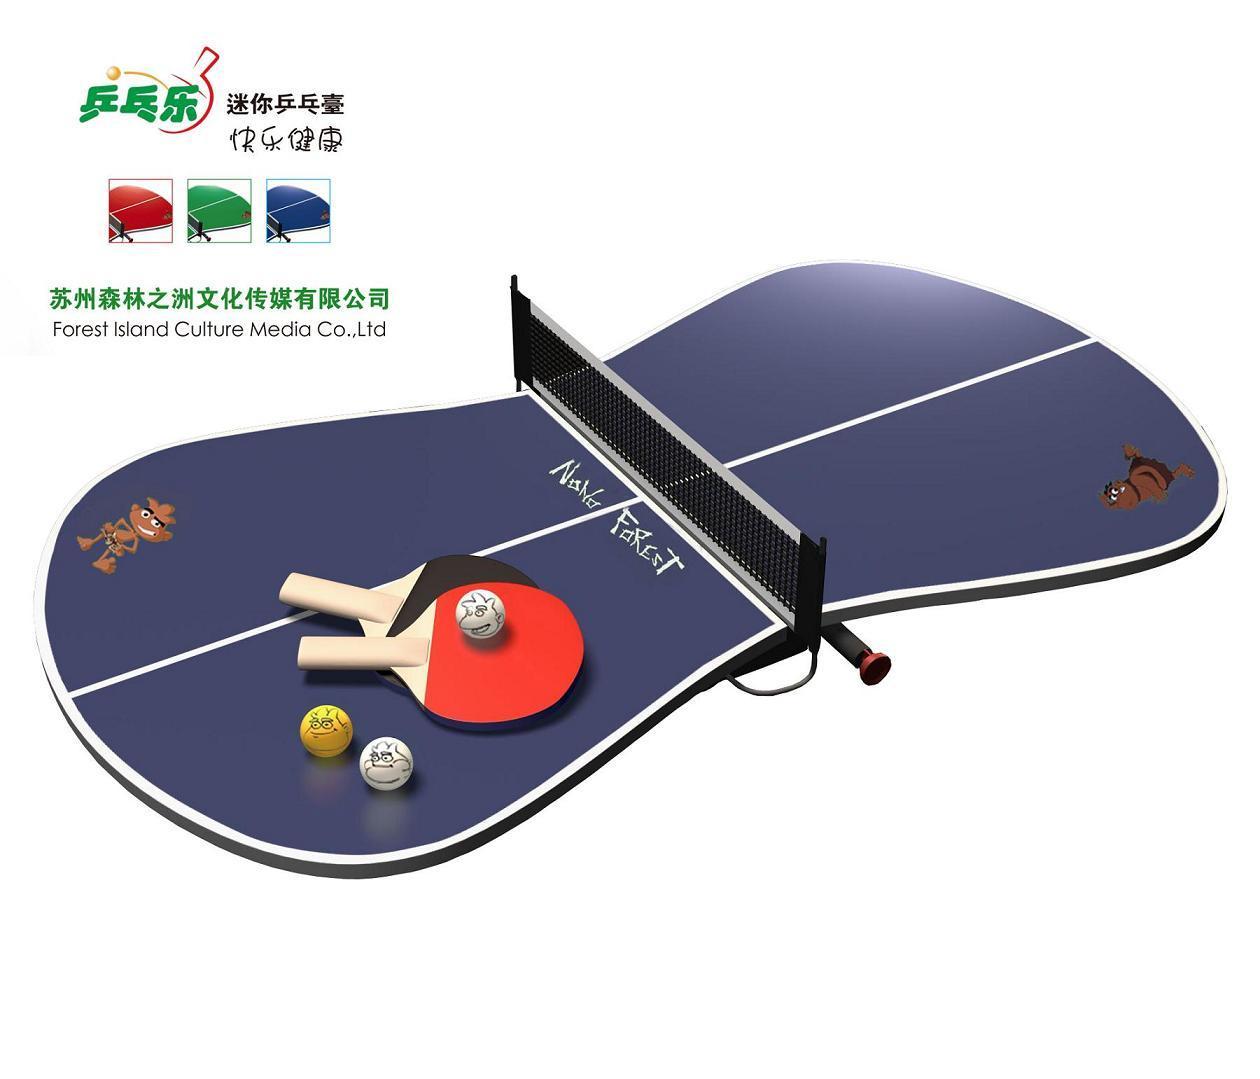 China mini adjustable table tennis equipment blue yy12tts02 b china table tennis table - Equipment for table tennis ...